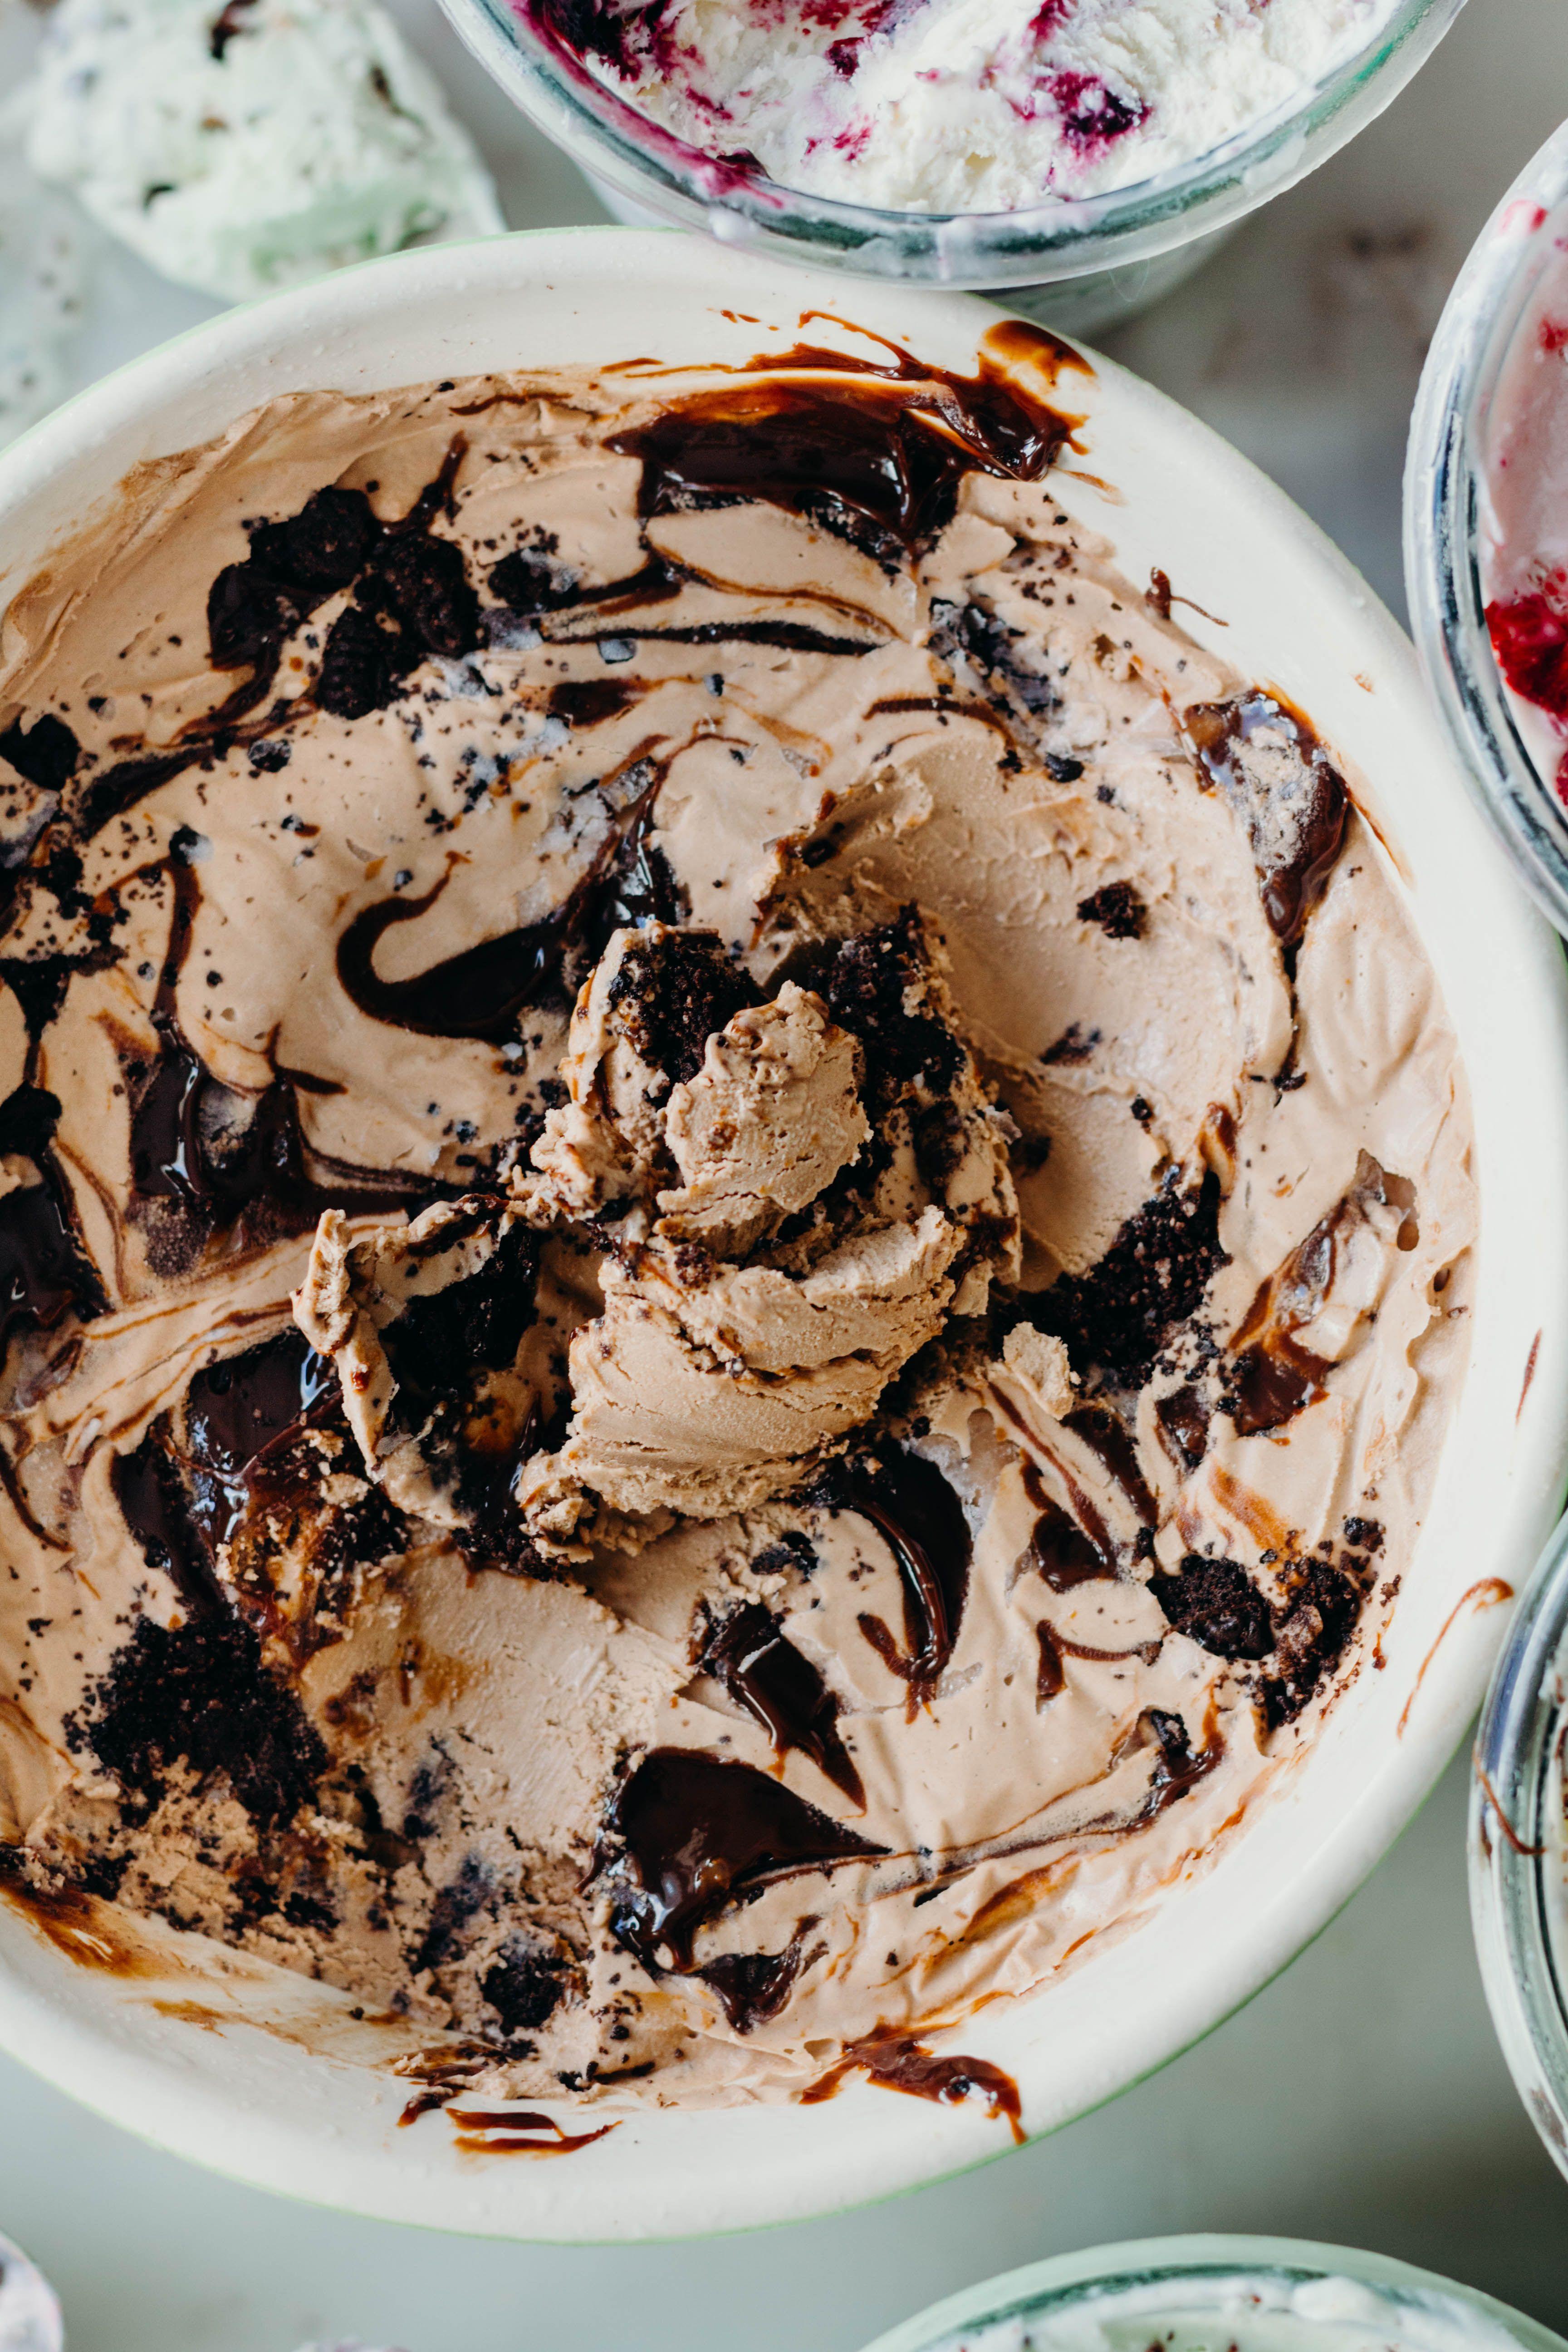 No Churn Chocolate Mocha Cookie Crumble Ice Cream The Sweet And Simple Kitchen Mocha Cookie Crumble Homemade Ice Cream Mocha Cookies